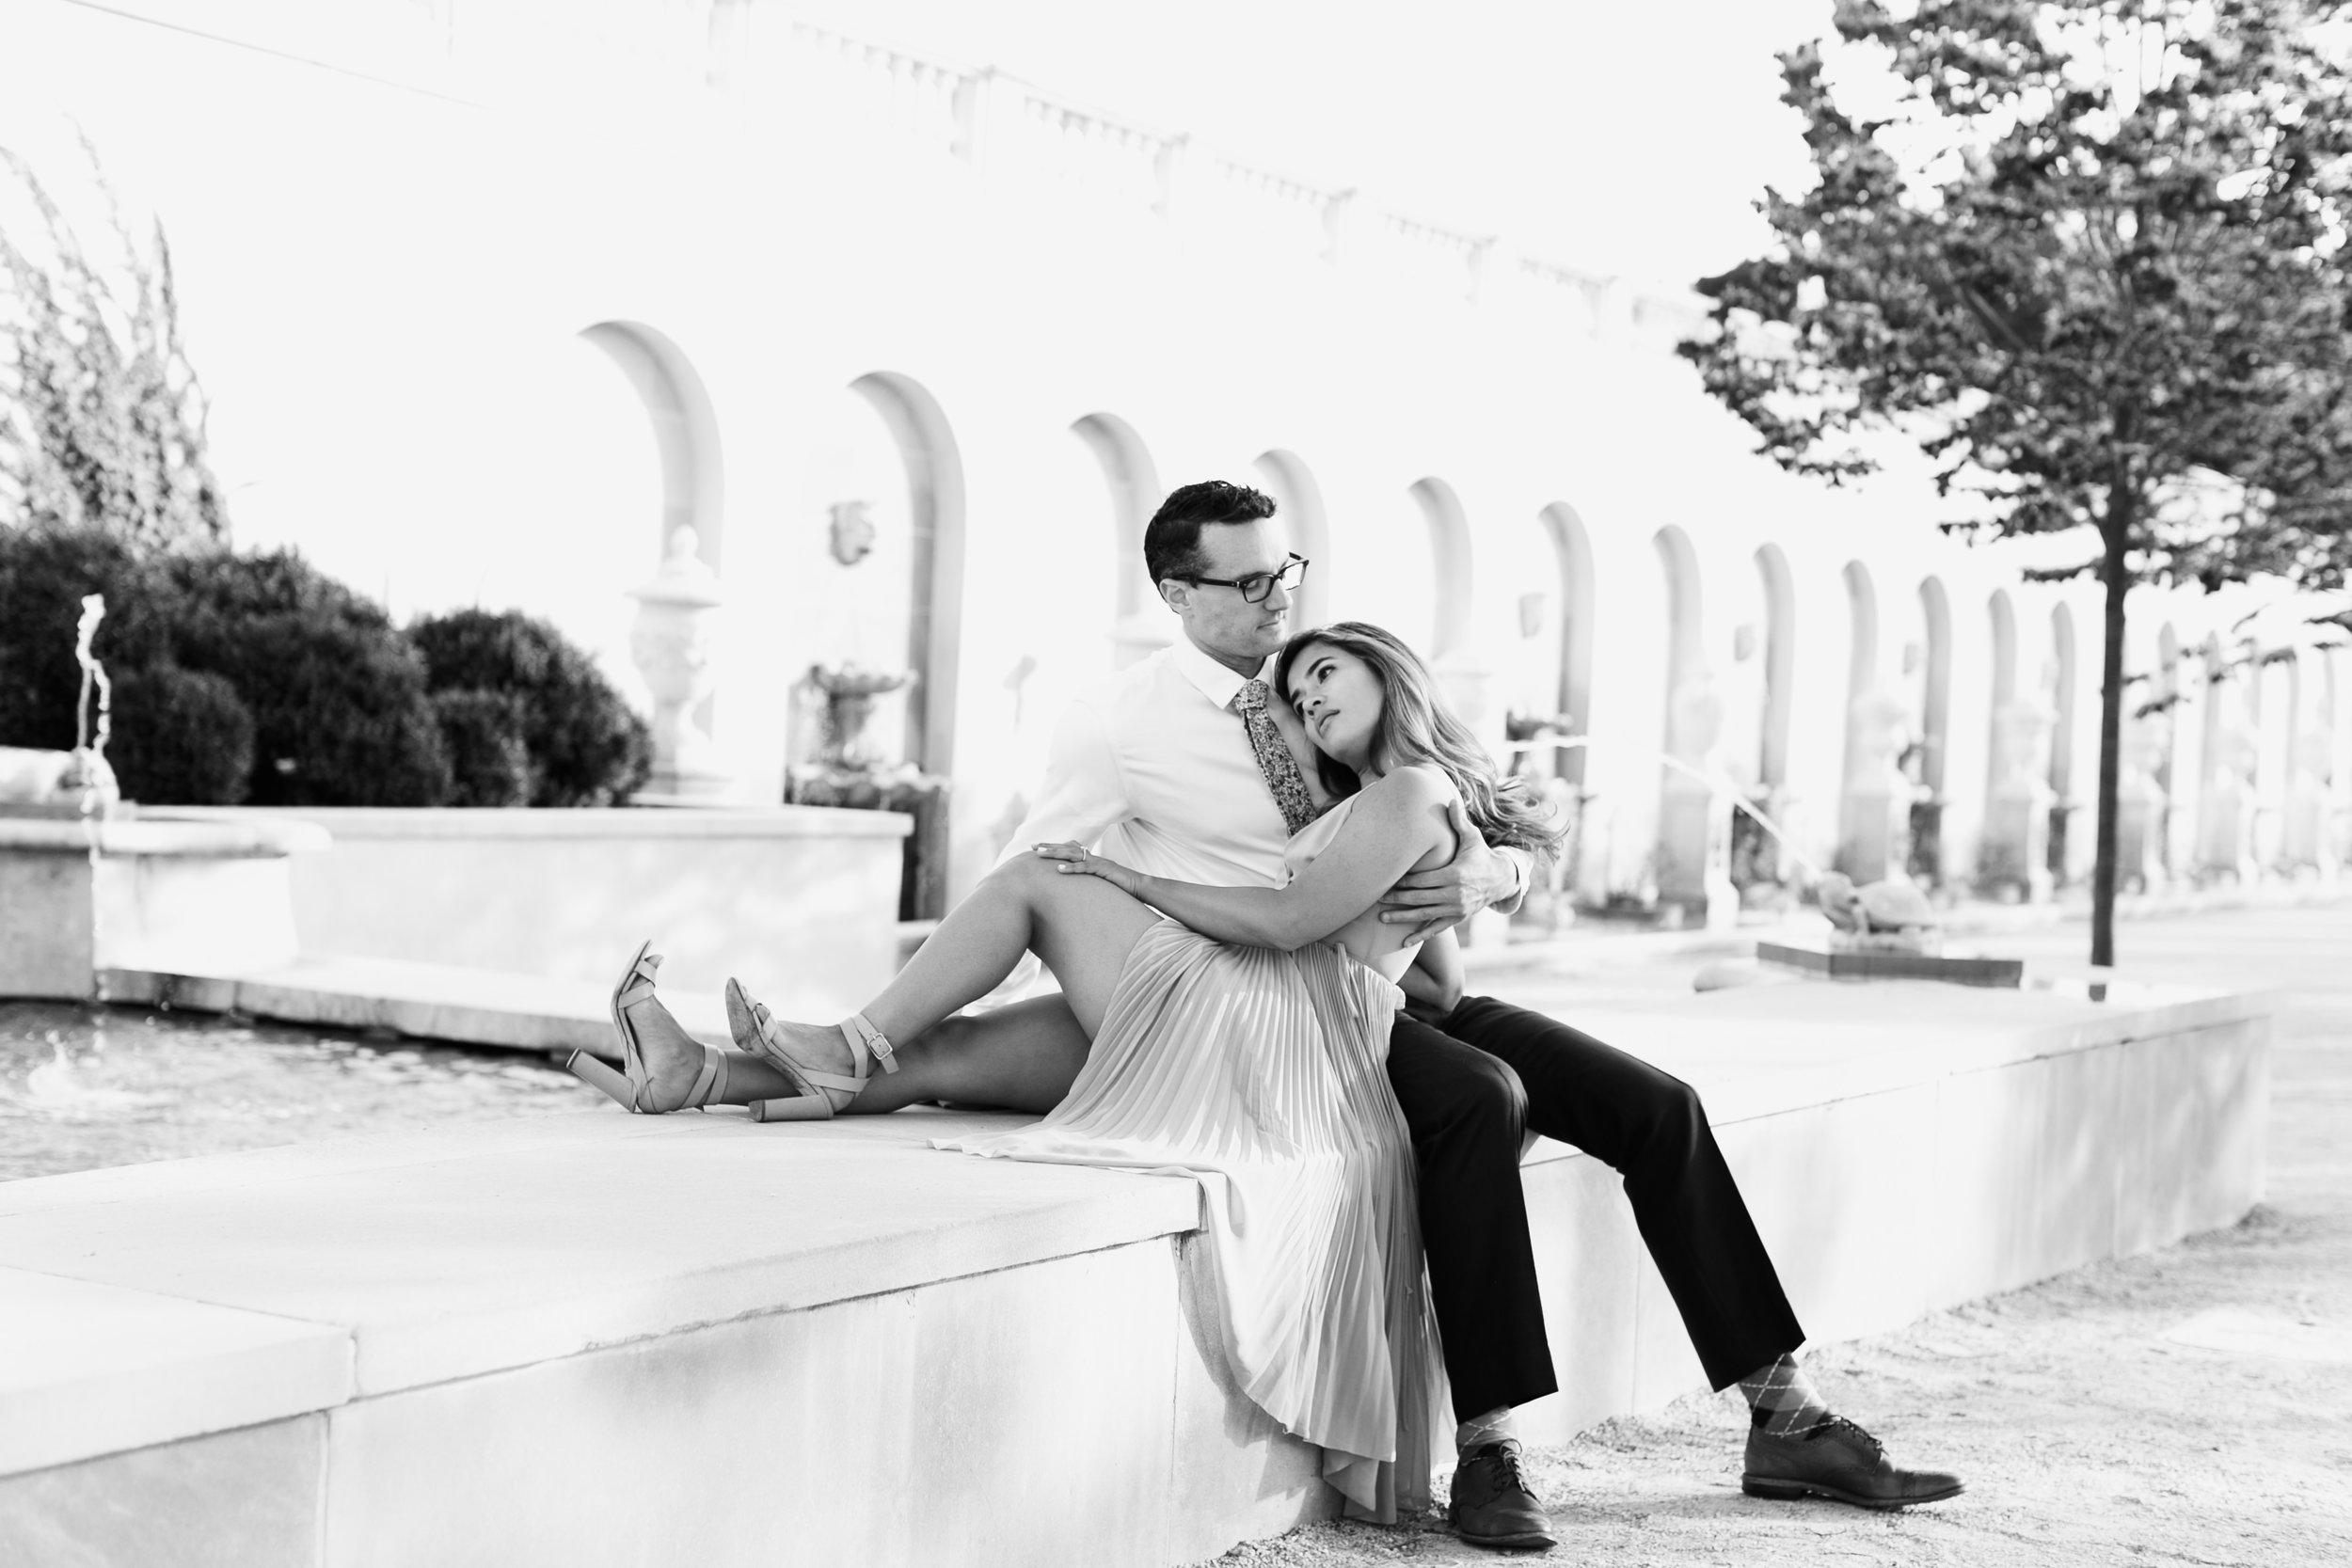 photography-natural-candid-engaged-proposal-philadelphia-wedding-longwood gardends-nature-flowers-modern-lifestyle-10.JPG